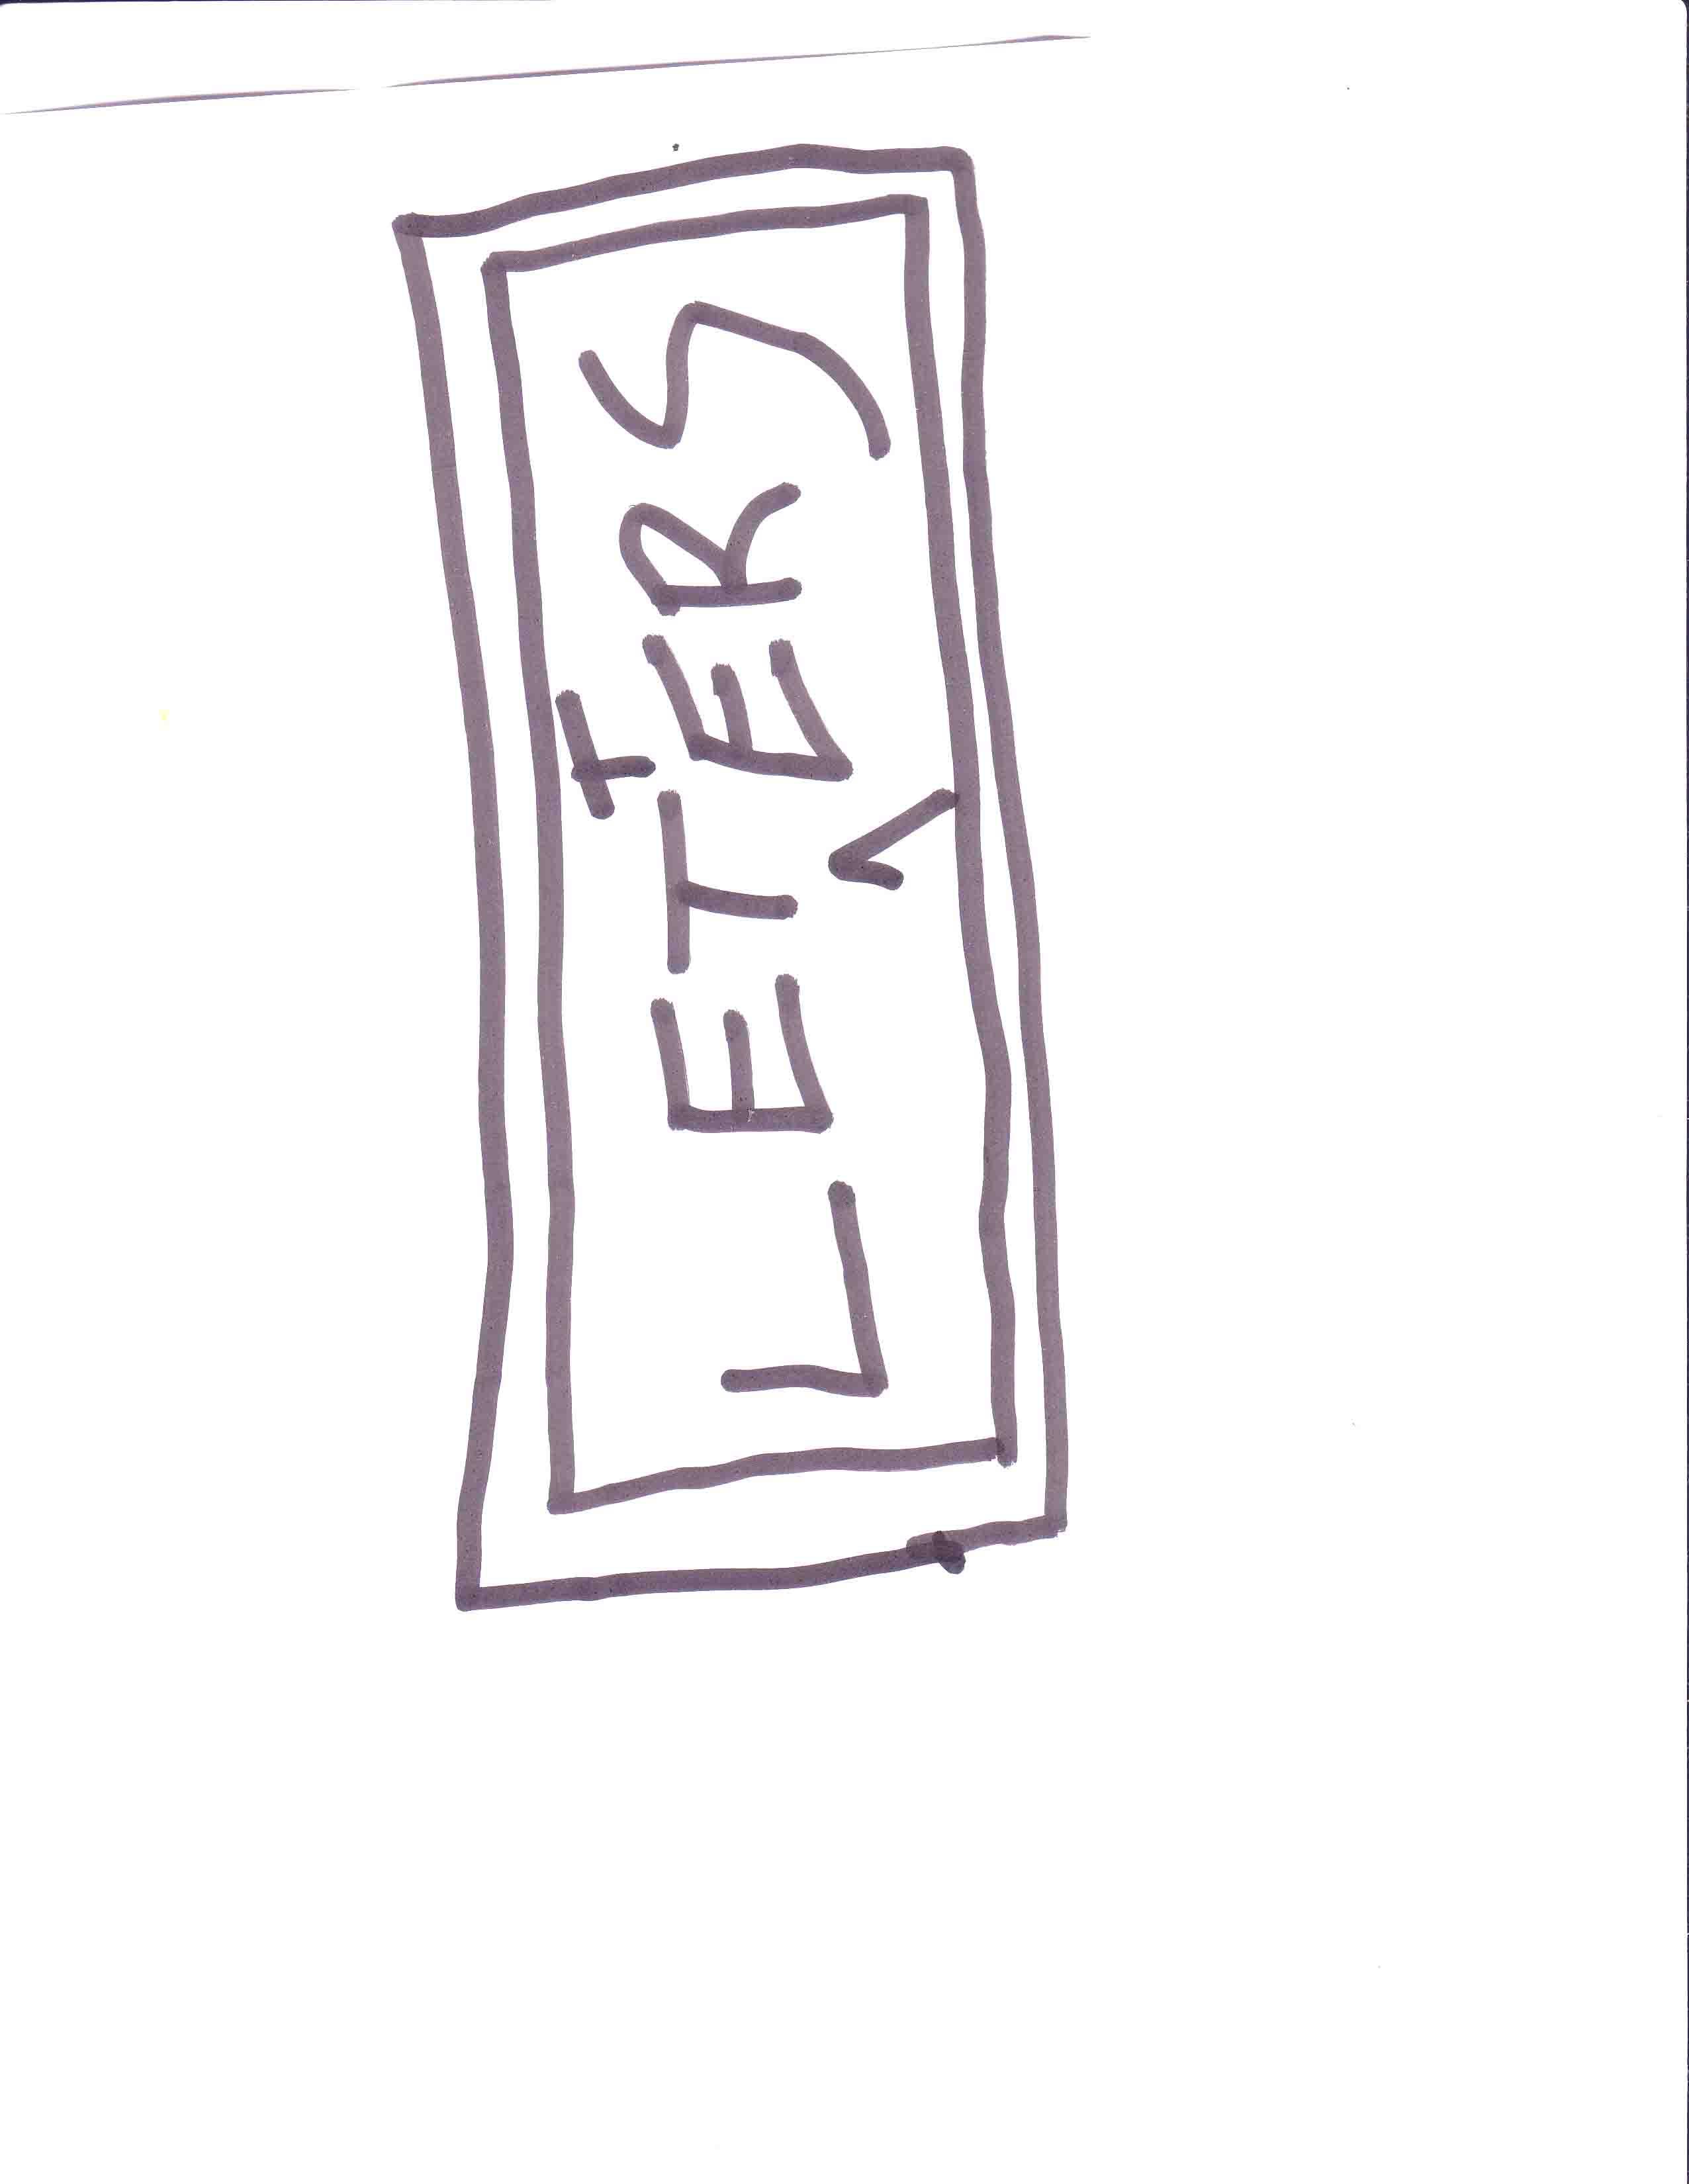 letterboxpic.jpg